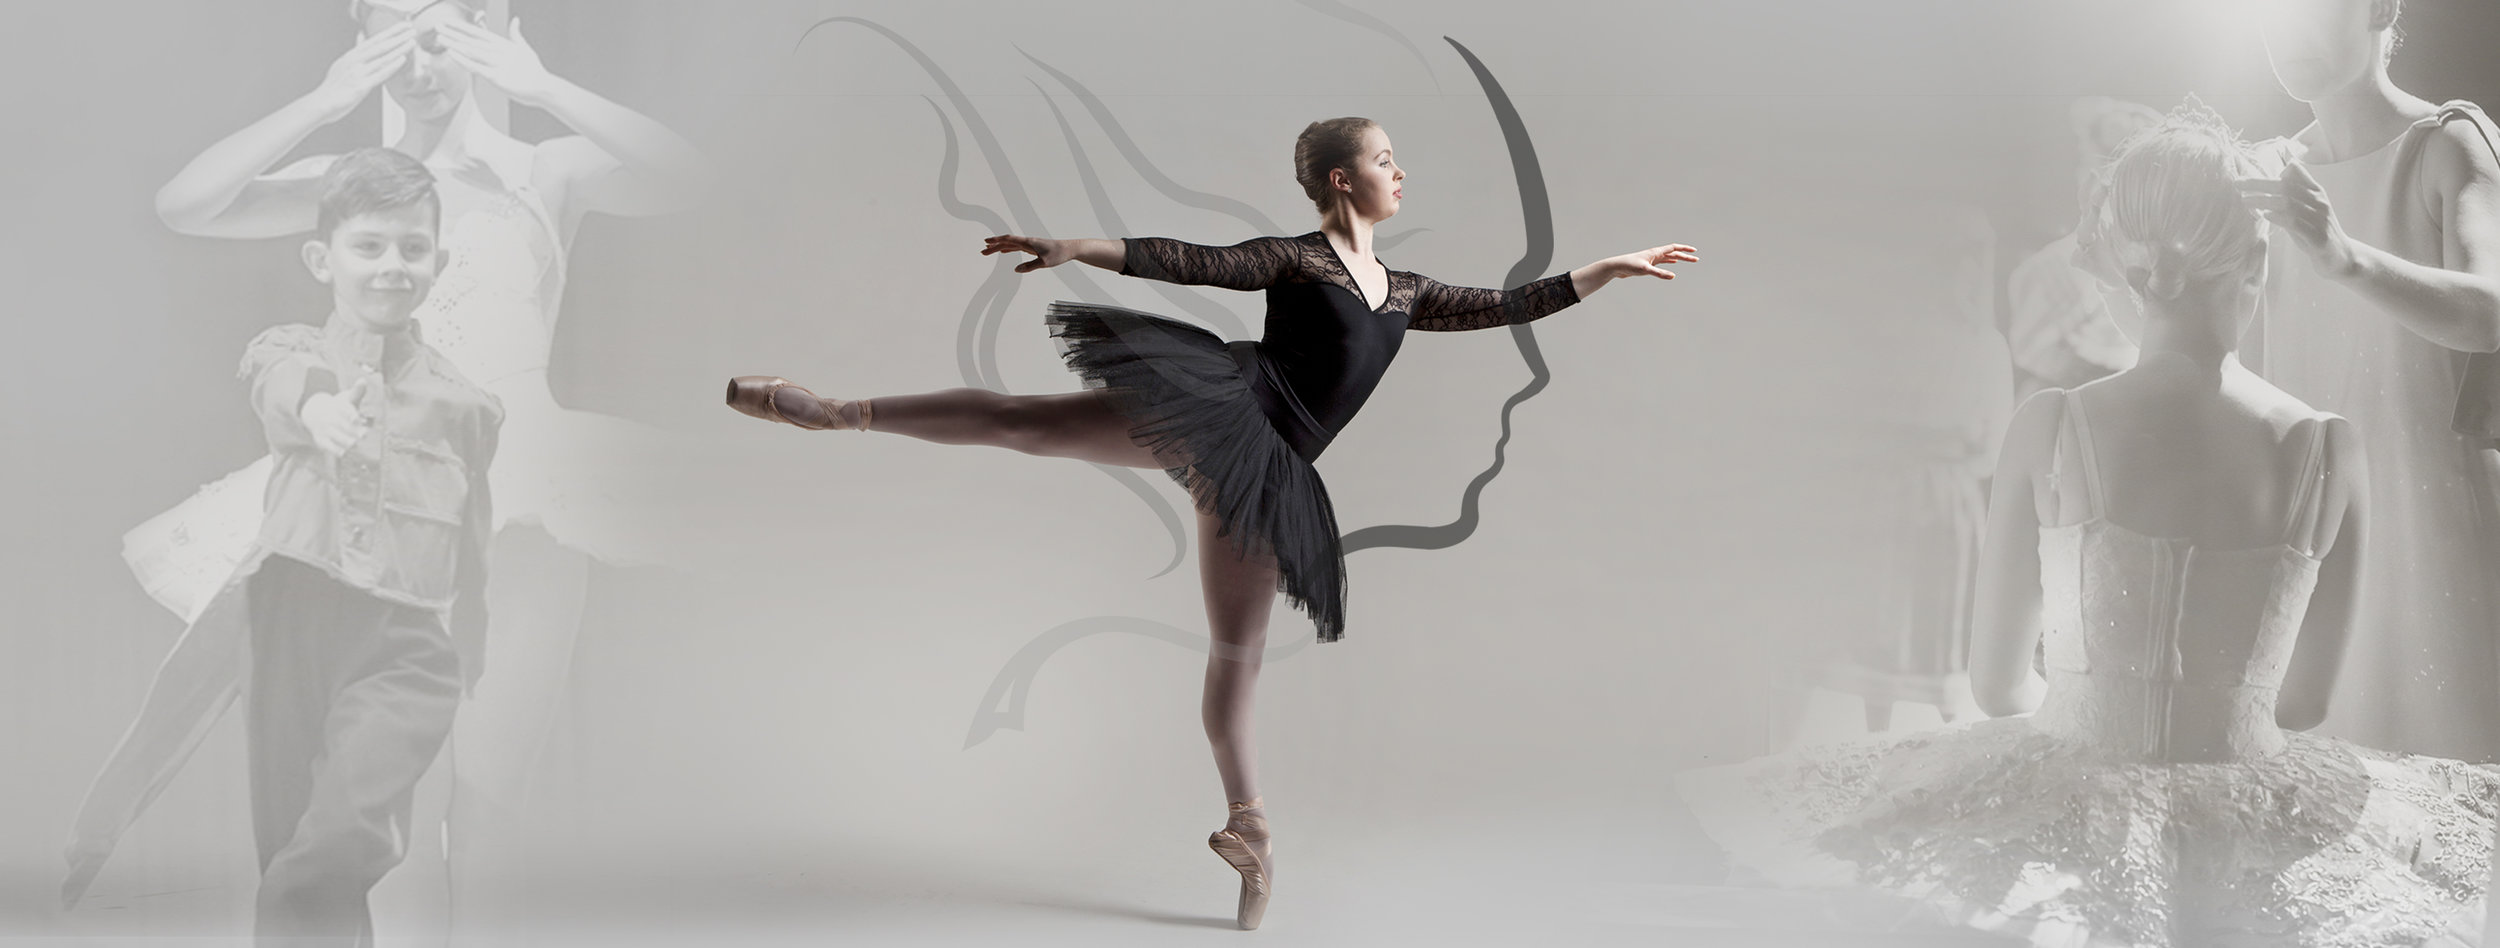 BAllet - Ballet Conservatoire Syllabus